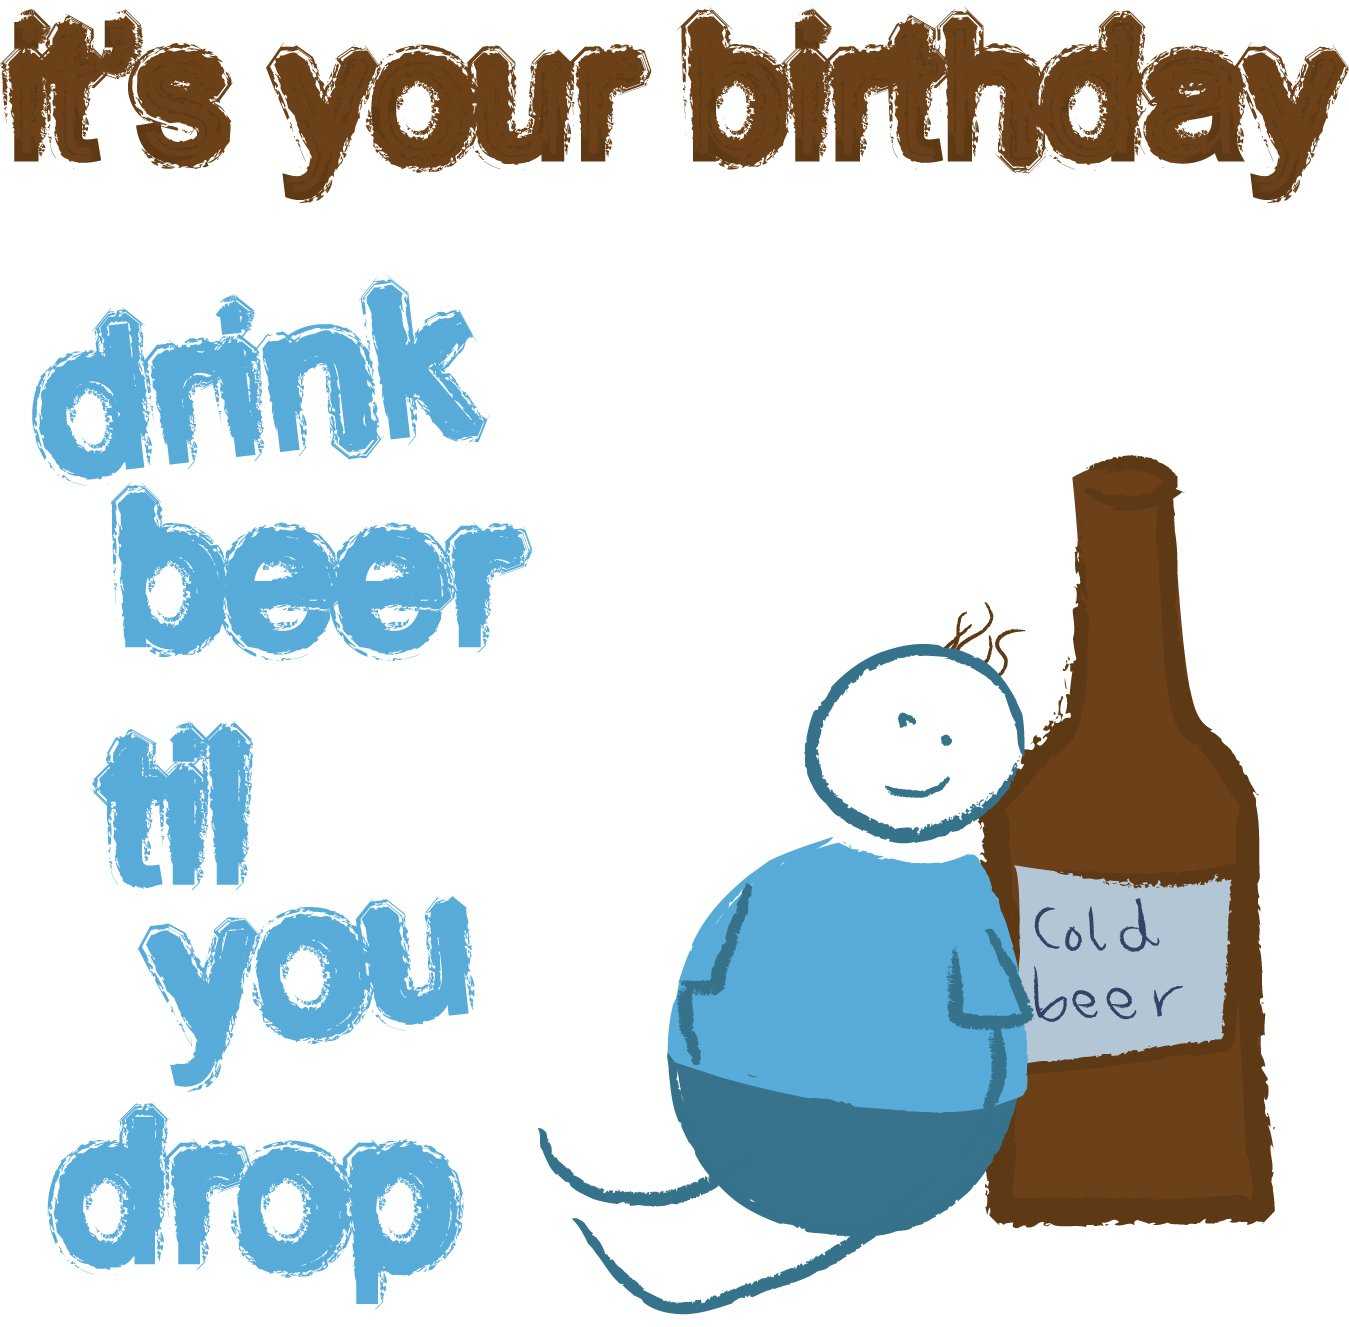 Beer til you drop ... Birthday Card